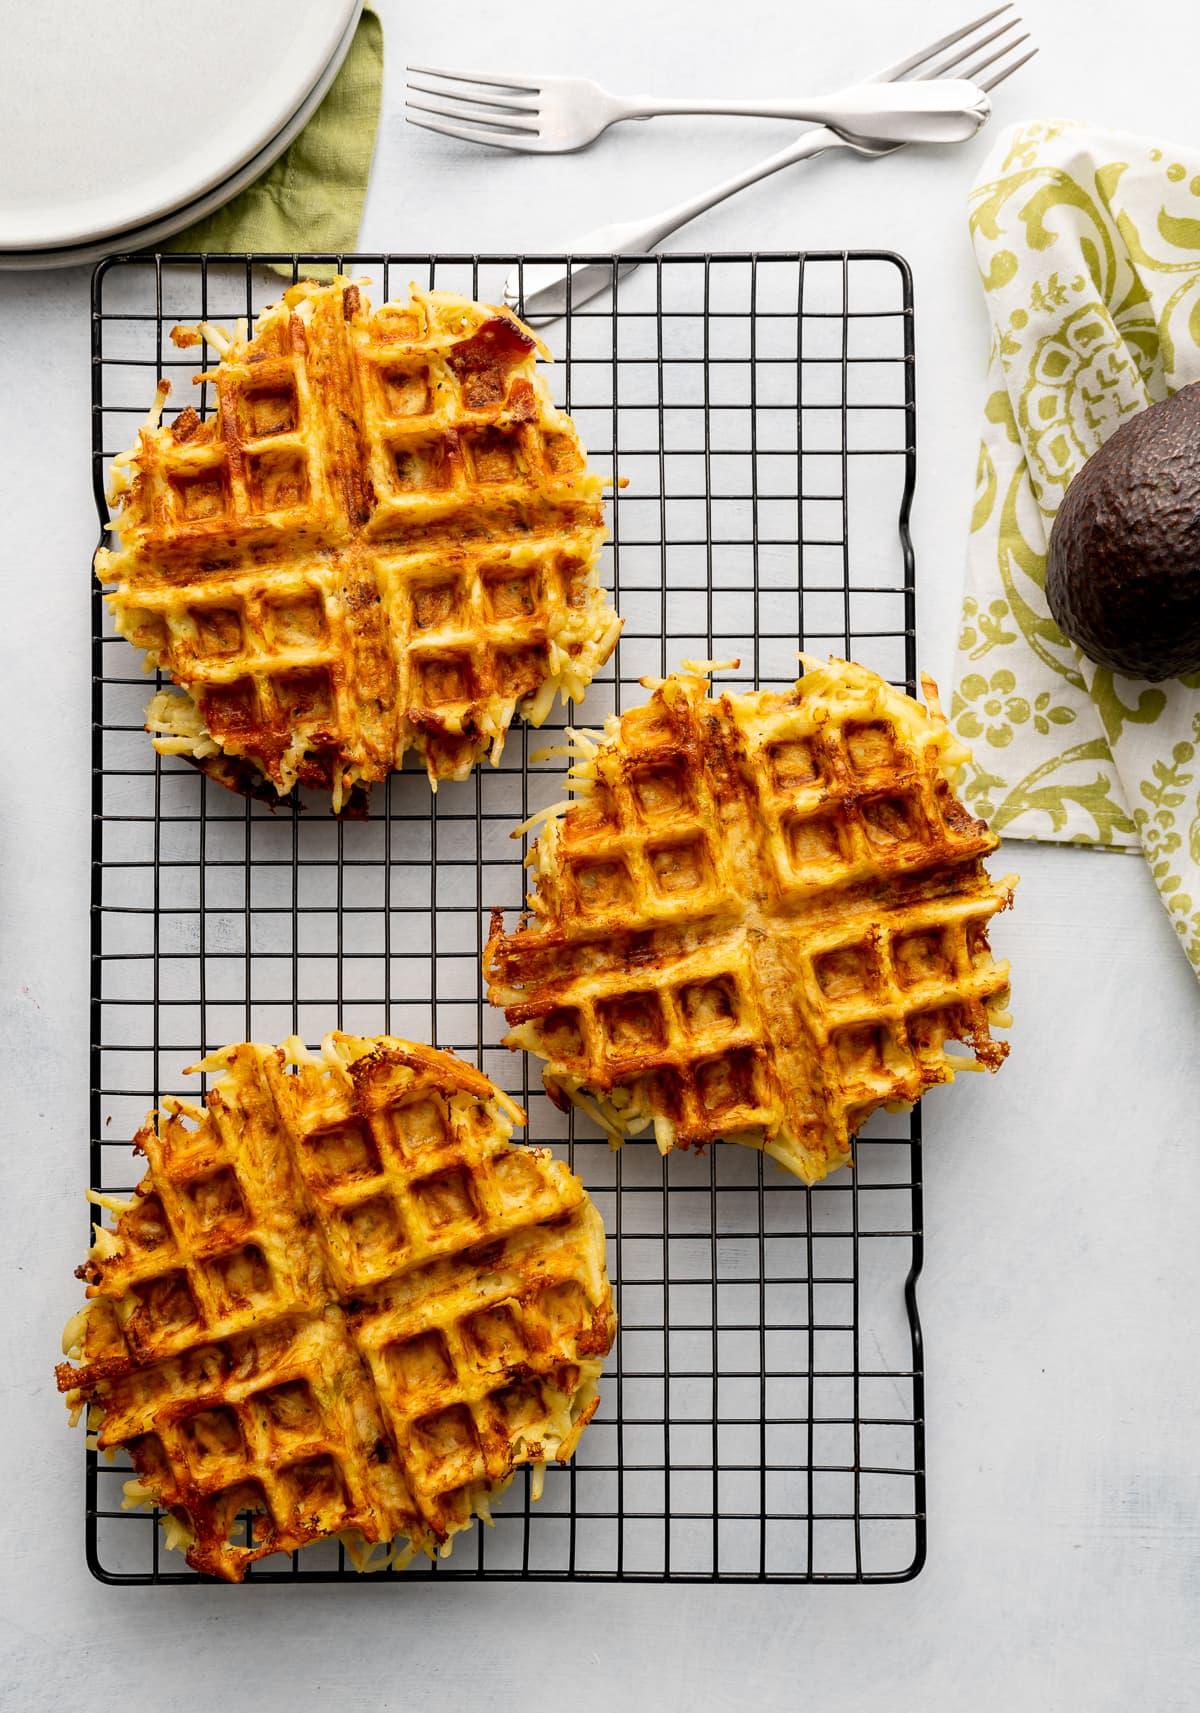 brown hash brown waffles on wire rack